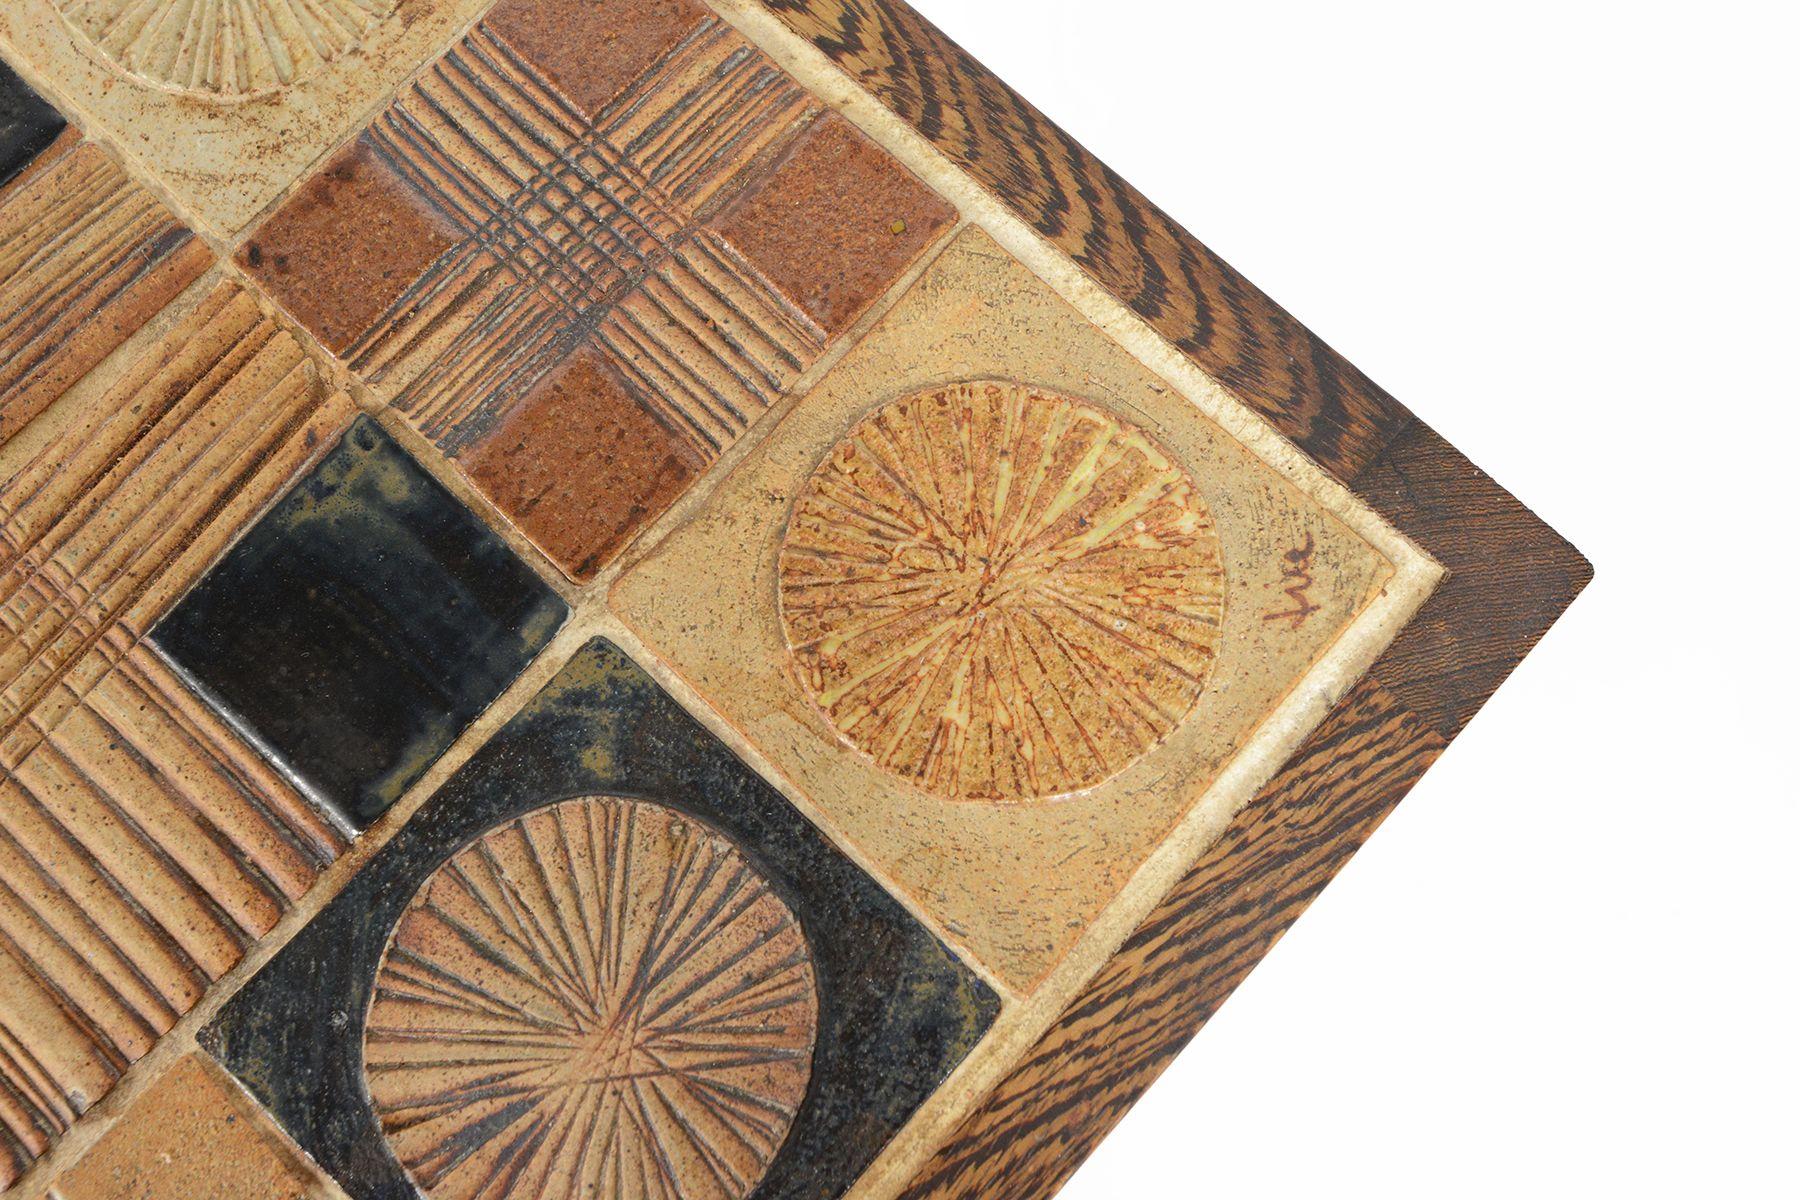 TUE POULSEN WENGE + CERAMIC TILE COFFEE TABLE - http://www.midcenturymobler.com/tue-poulsen-wenge-ceramic-tile-coffee-table/